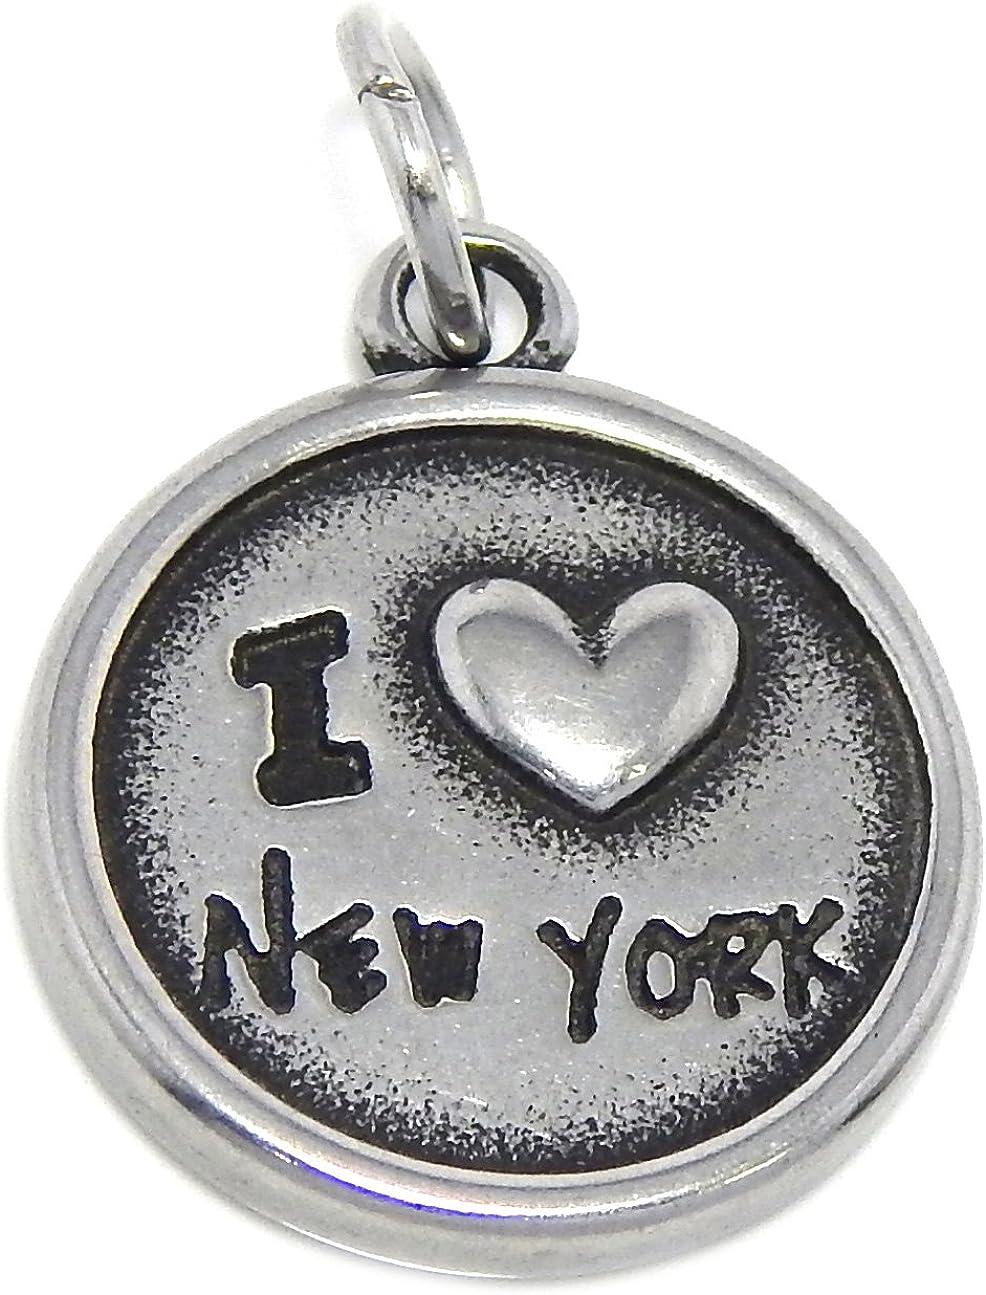 GemStorm Stainless Steel Dangling I Love New York/American Flag Plaque Message Charm for Bracelet